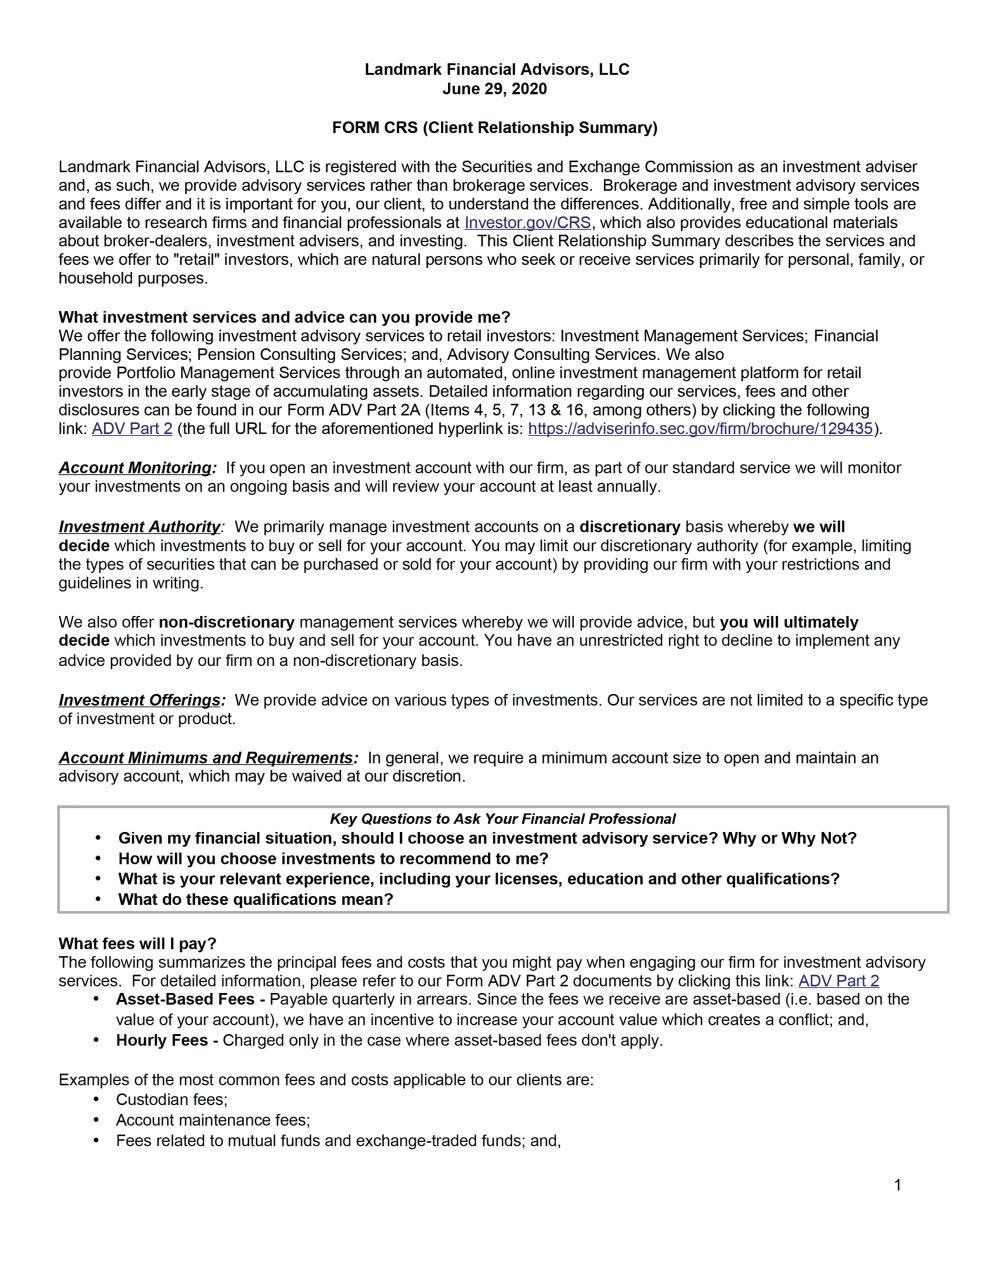 Form CRS page 1 Landmark Financial Advisors